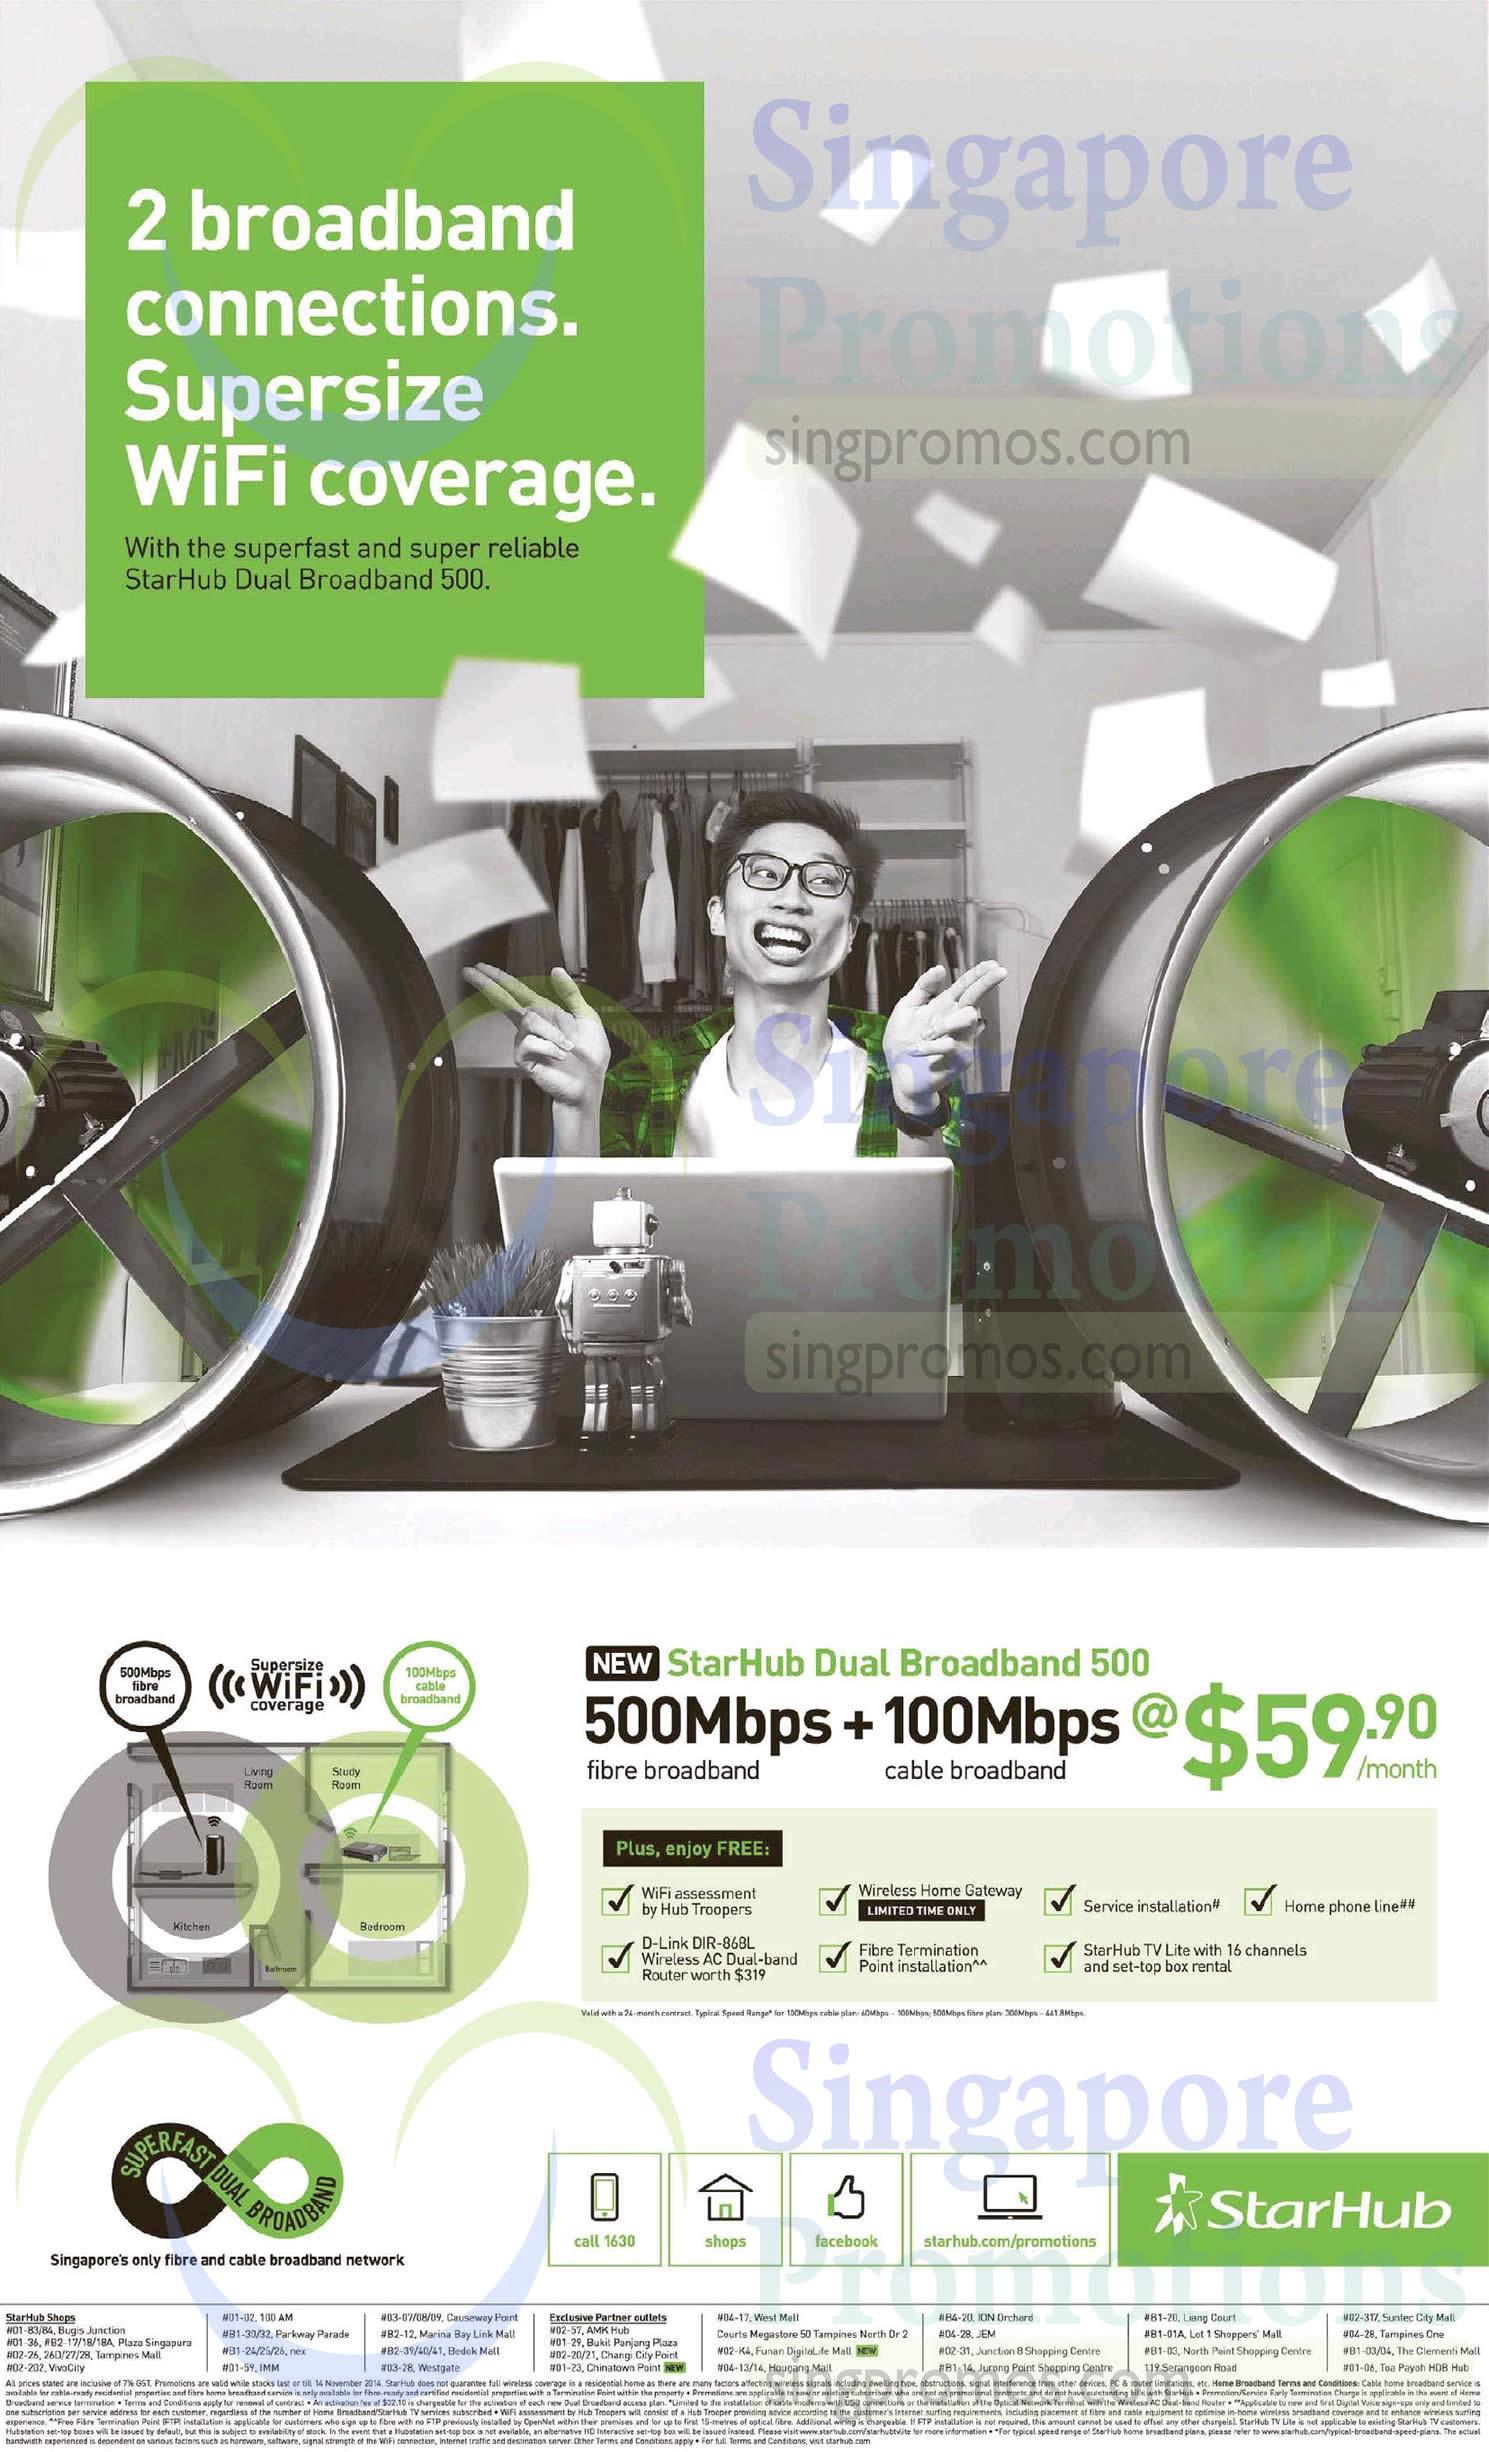 59.90 StarHub Dual Broadband 500 500Mbps Fibre Broadband Plus, 100Mbps Cable Broadband